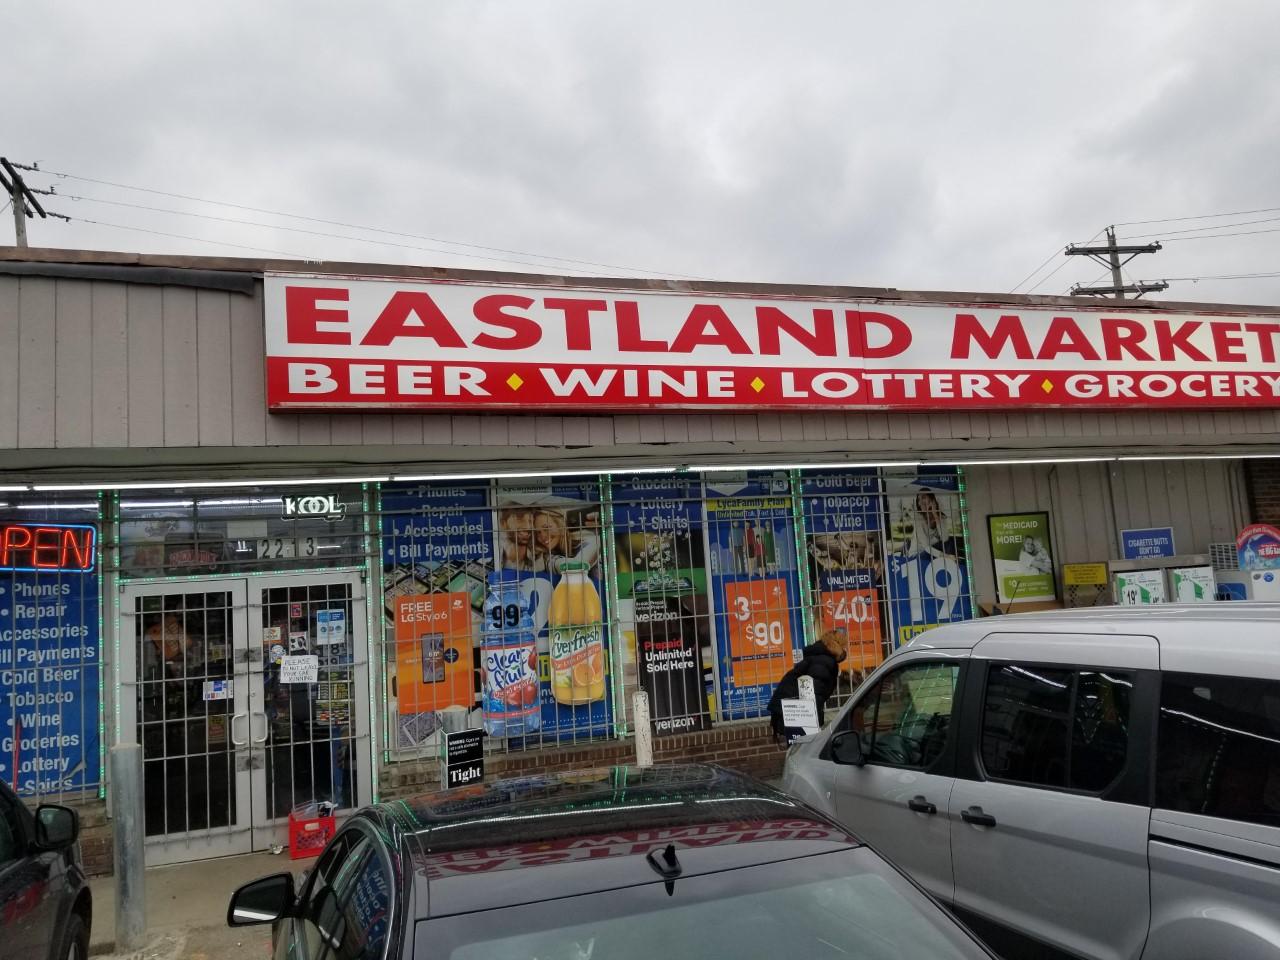 EastLand Market